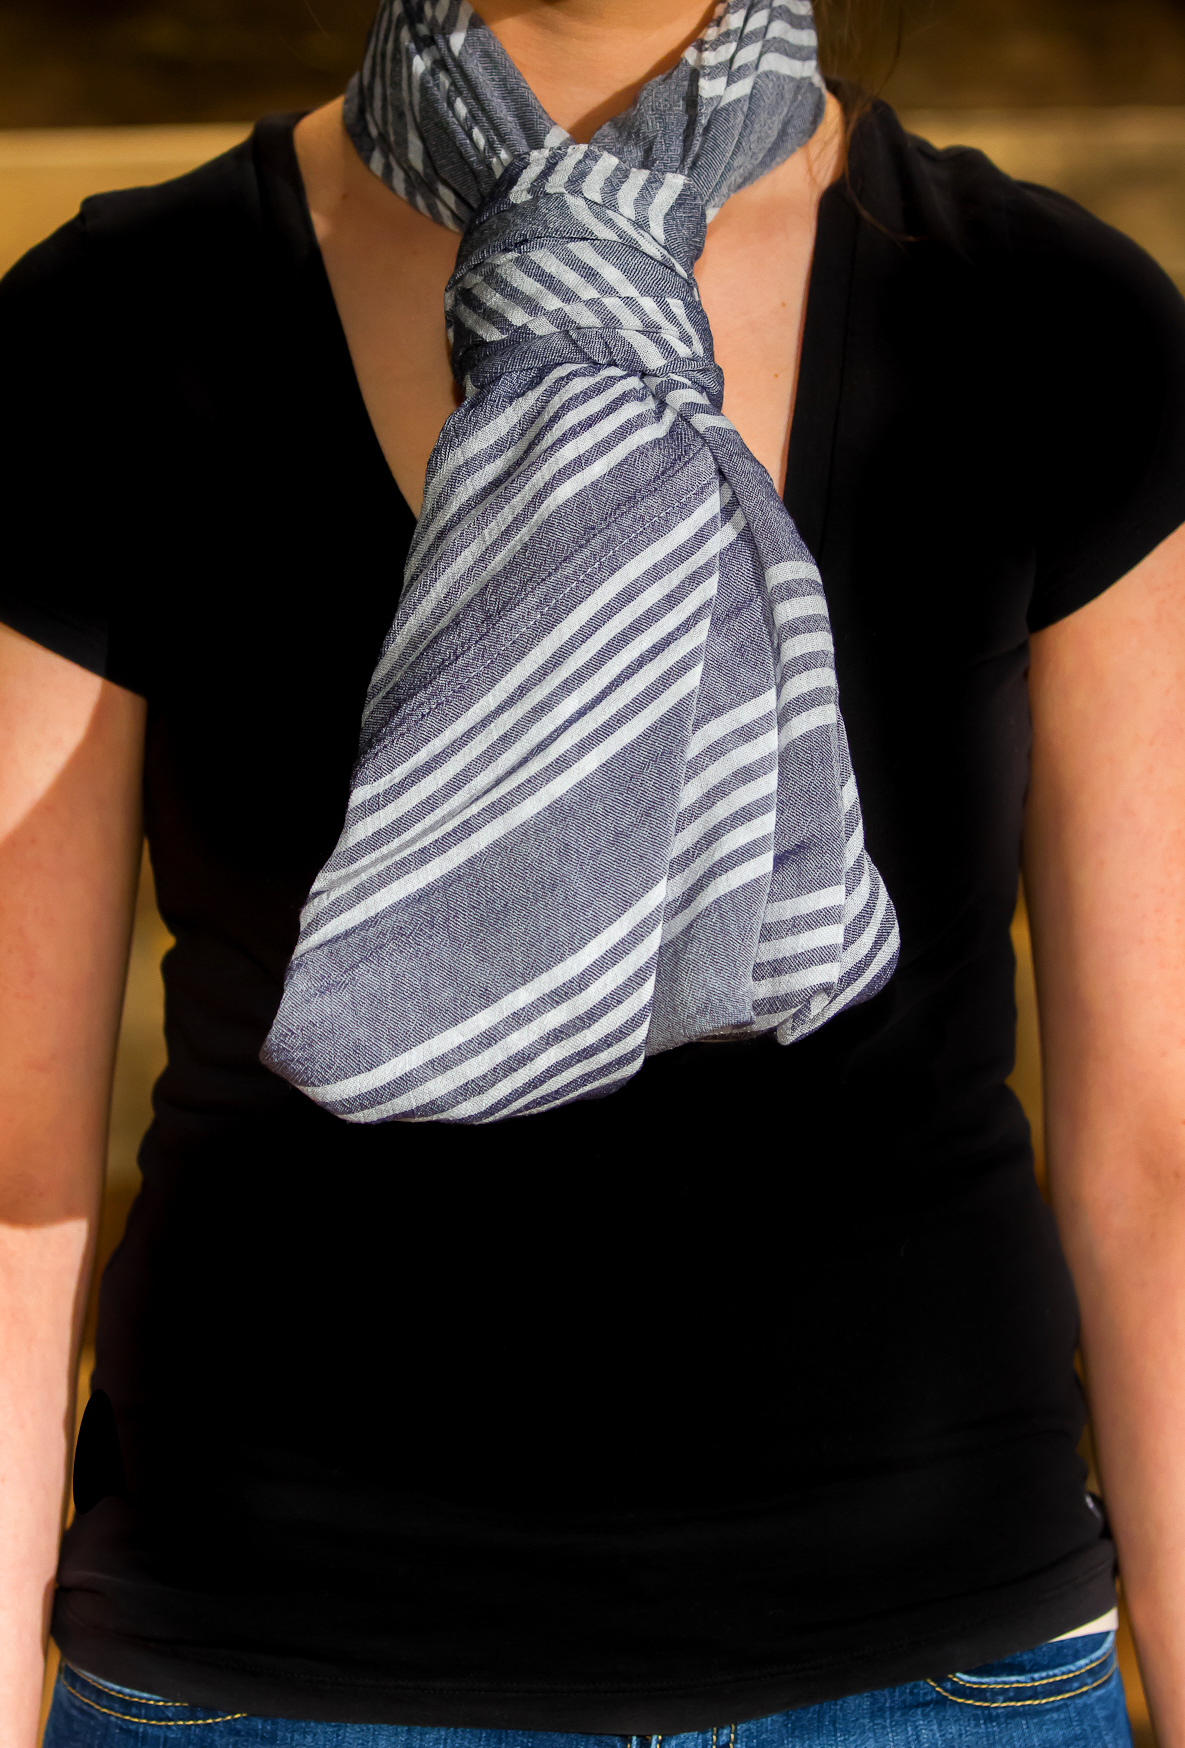 Tie (stripes)